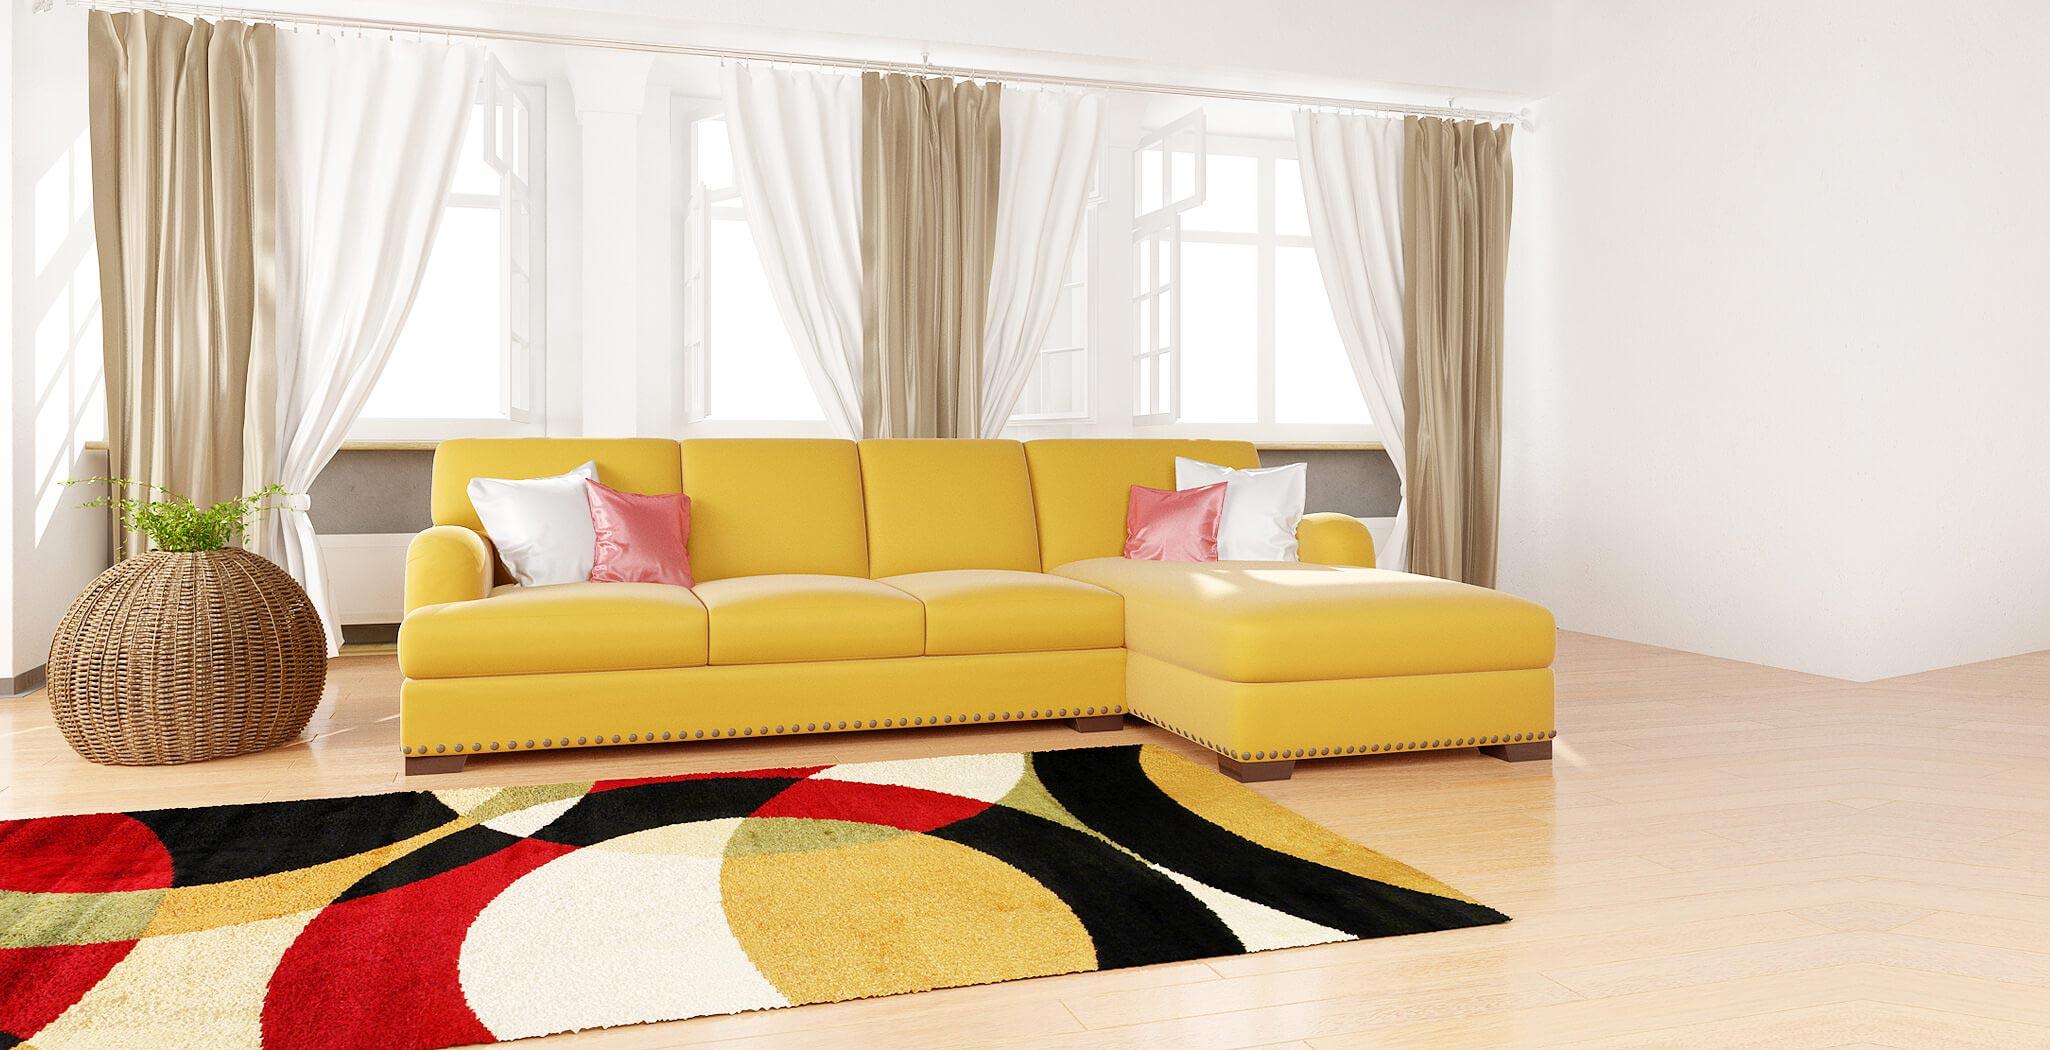 brighton panel furniture gallery 5